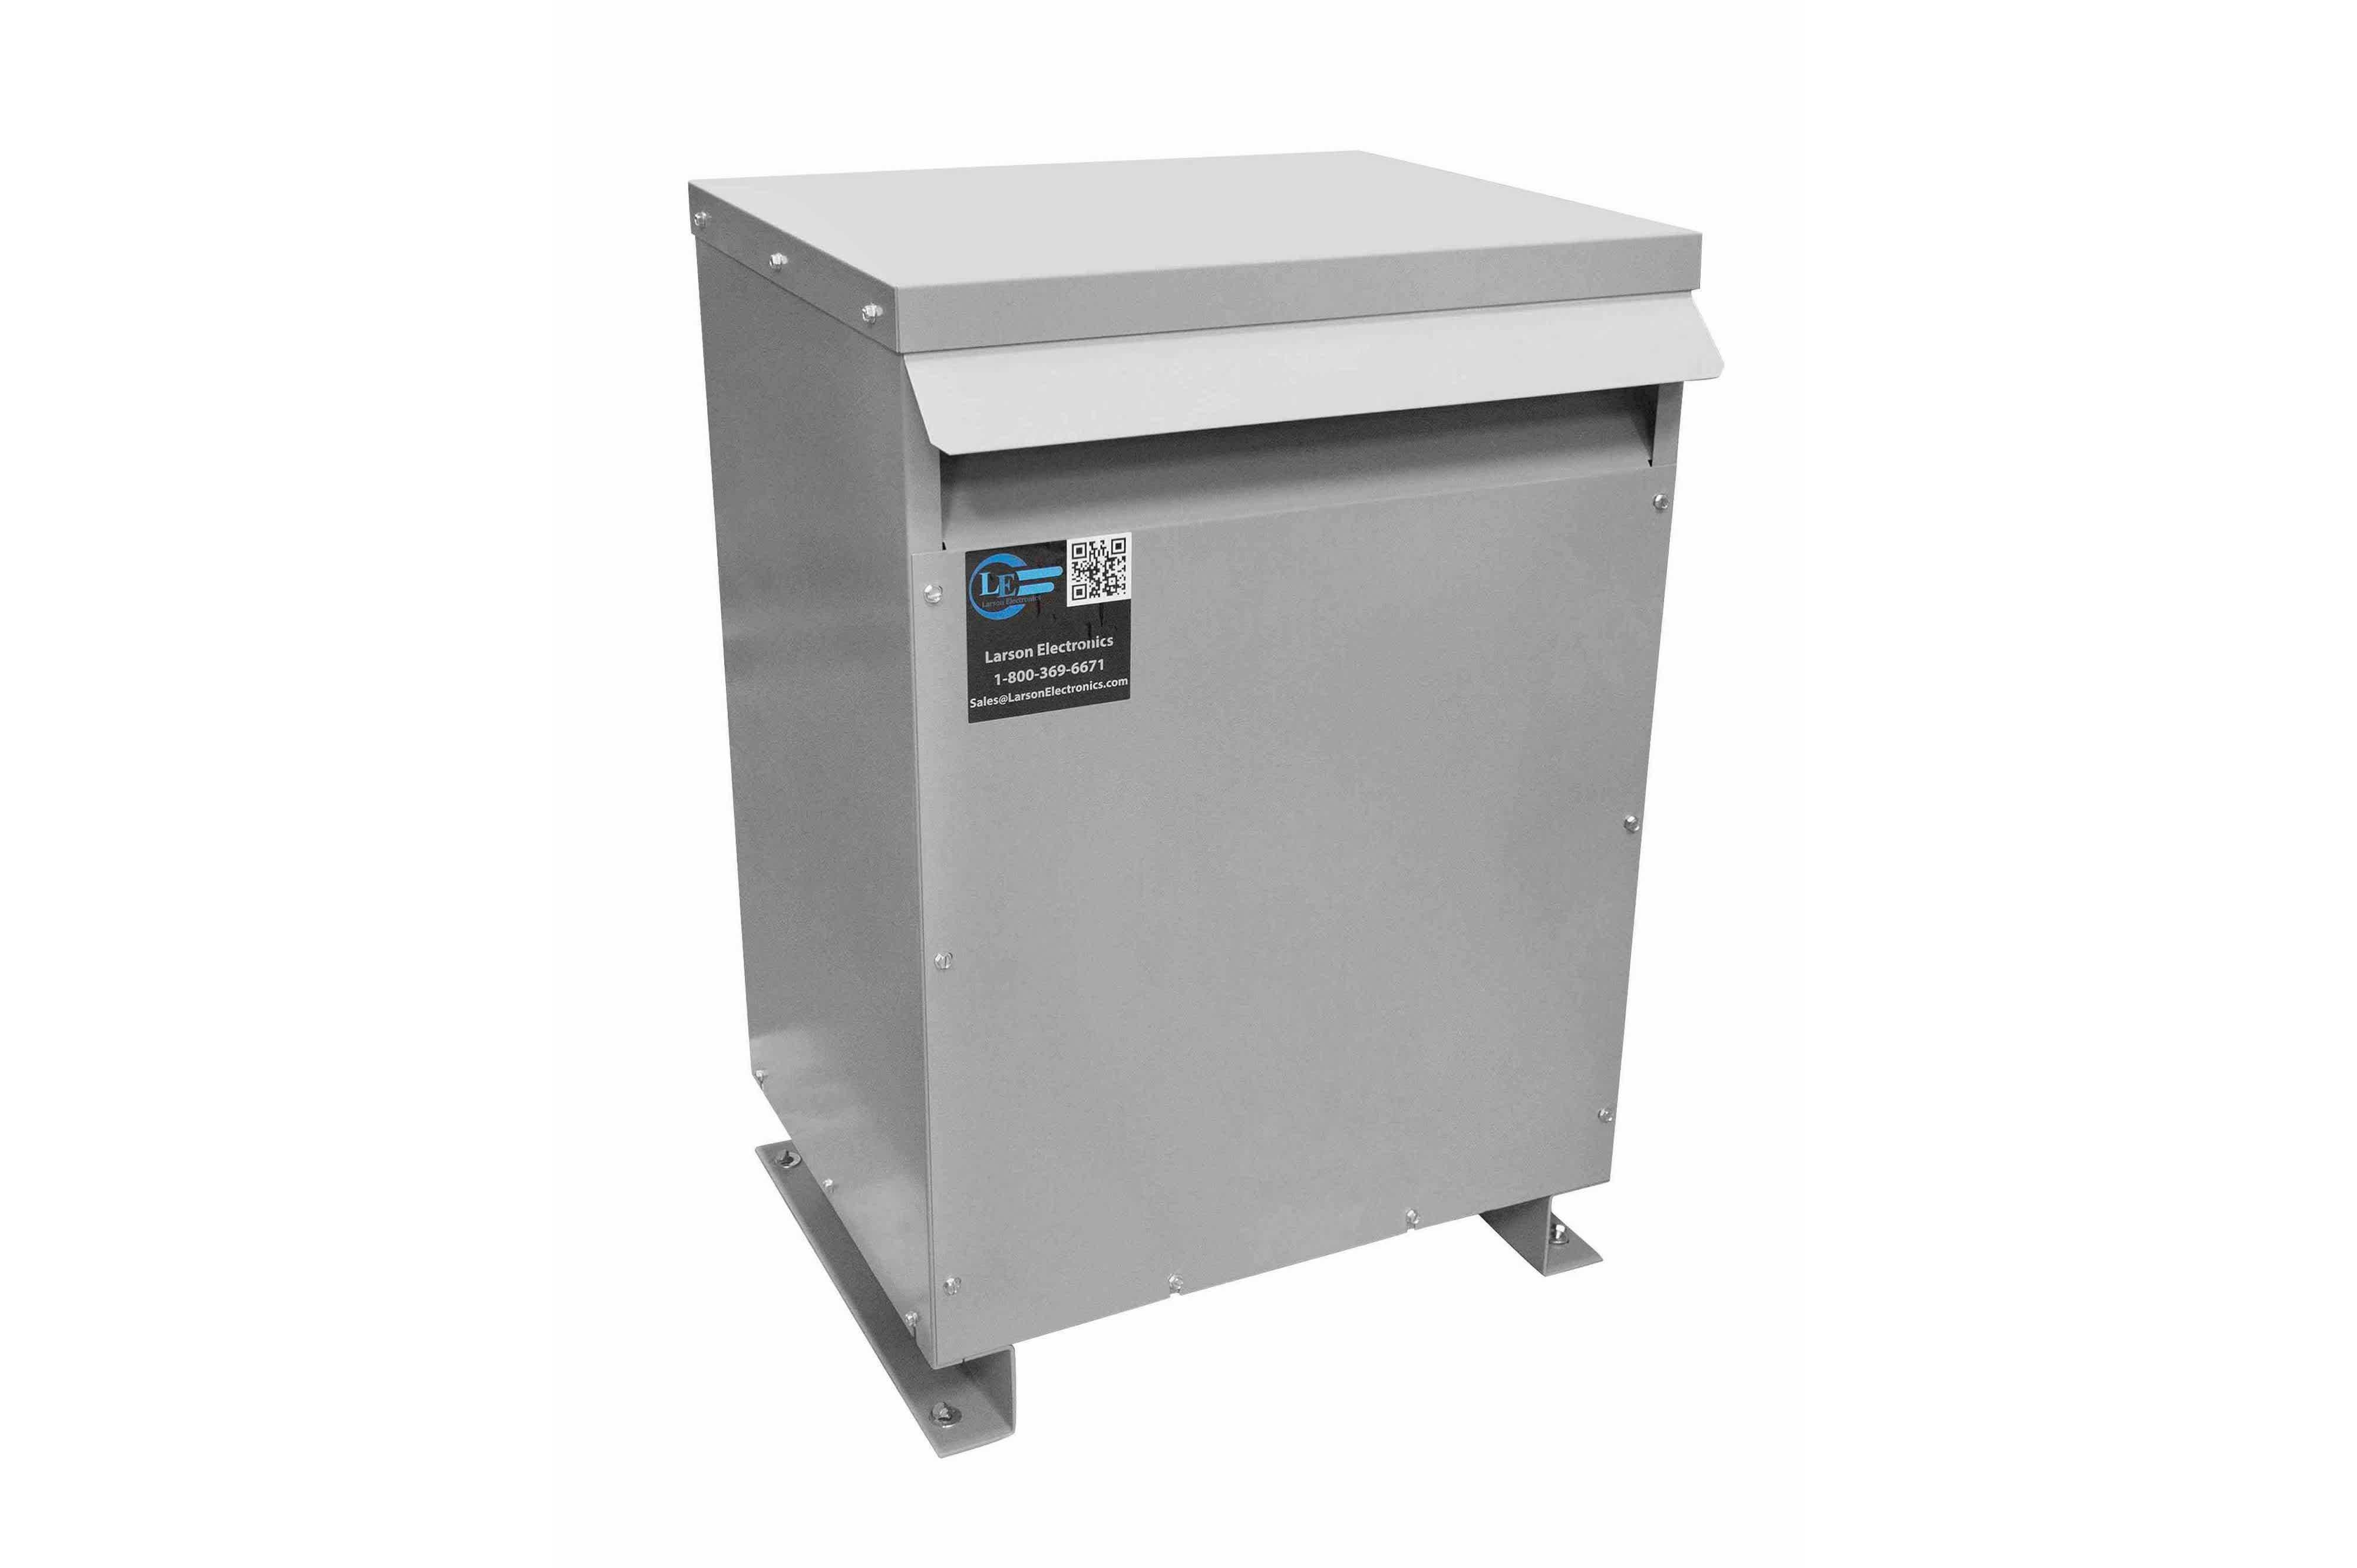 225 kVA 3PH DOE Transformer, 460V Delta Primary, 400Y/231 Wye-N Secondary, N3R, Ventilated, 60 Hz